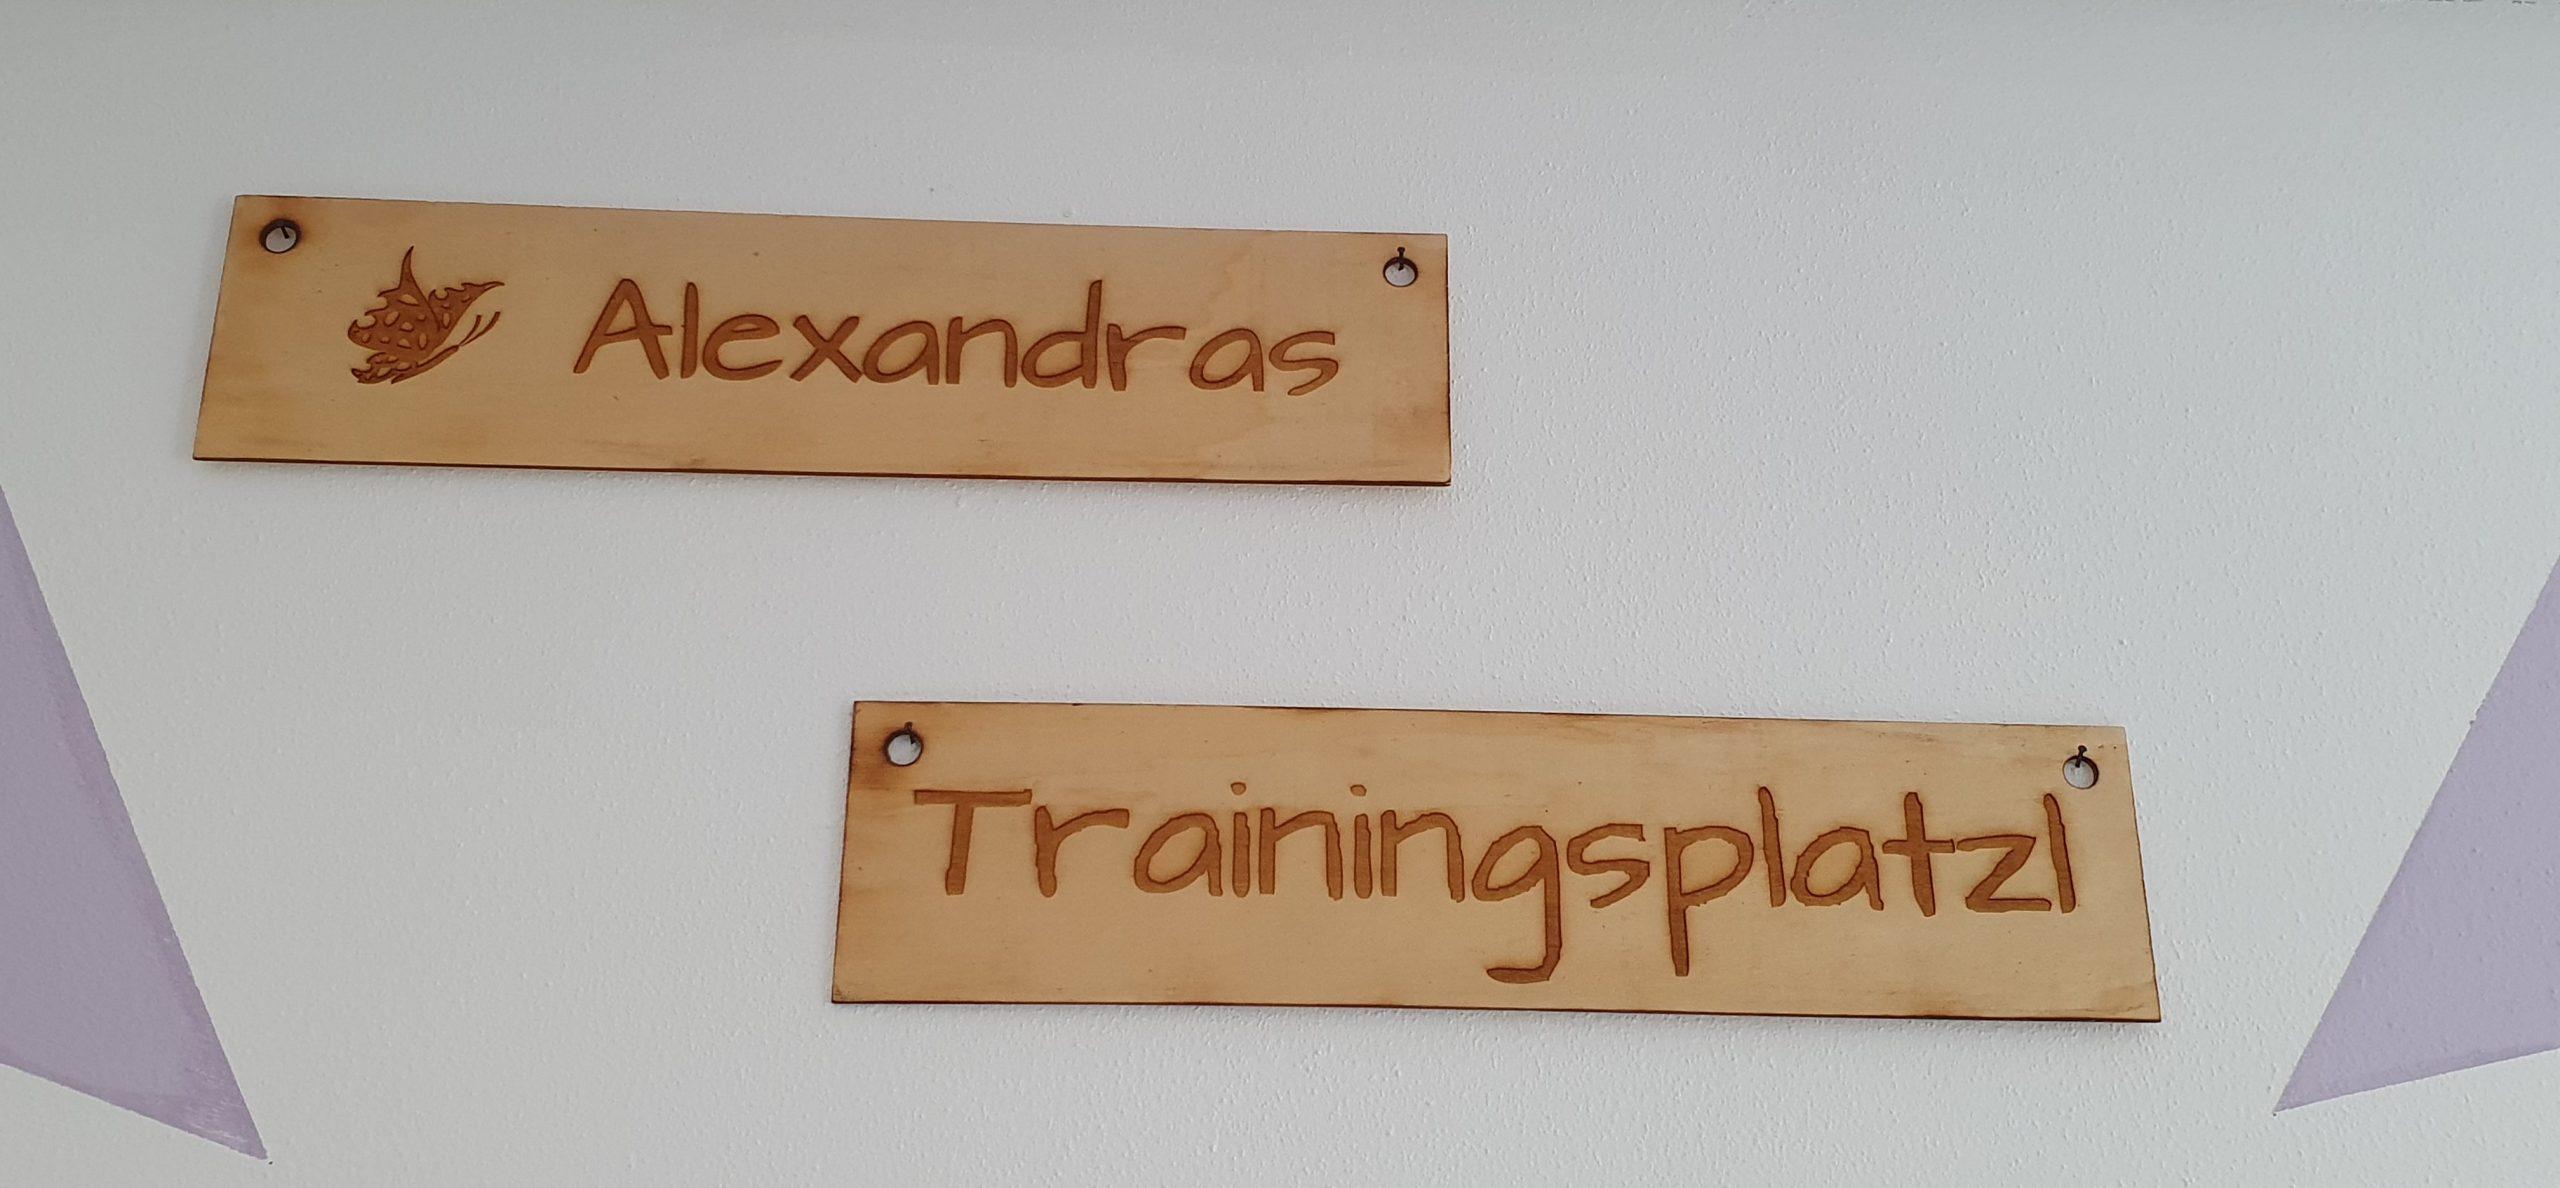 Rehasport in Waldkraiburg - Alexandras Trainingsplatzl